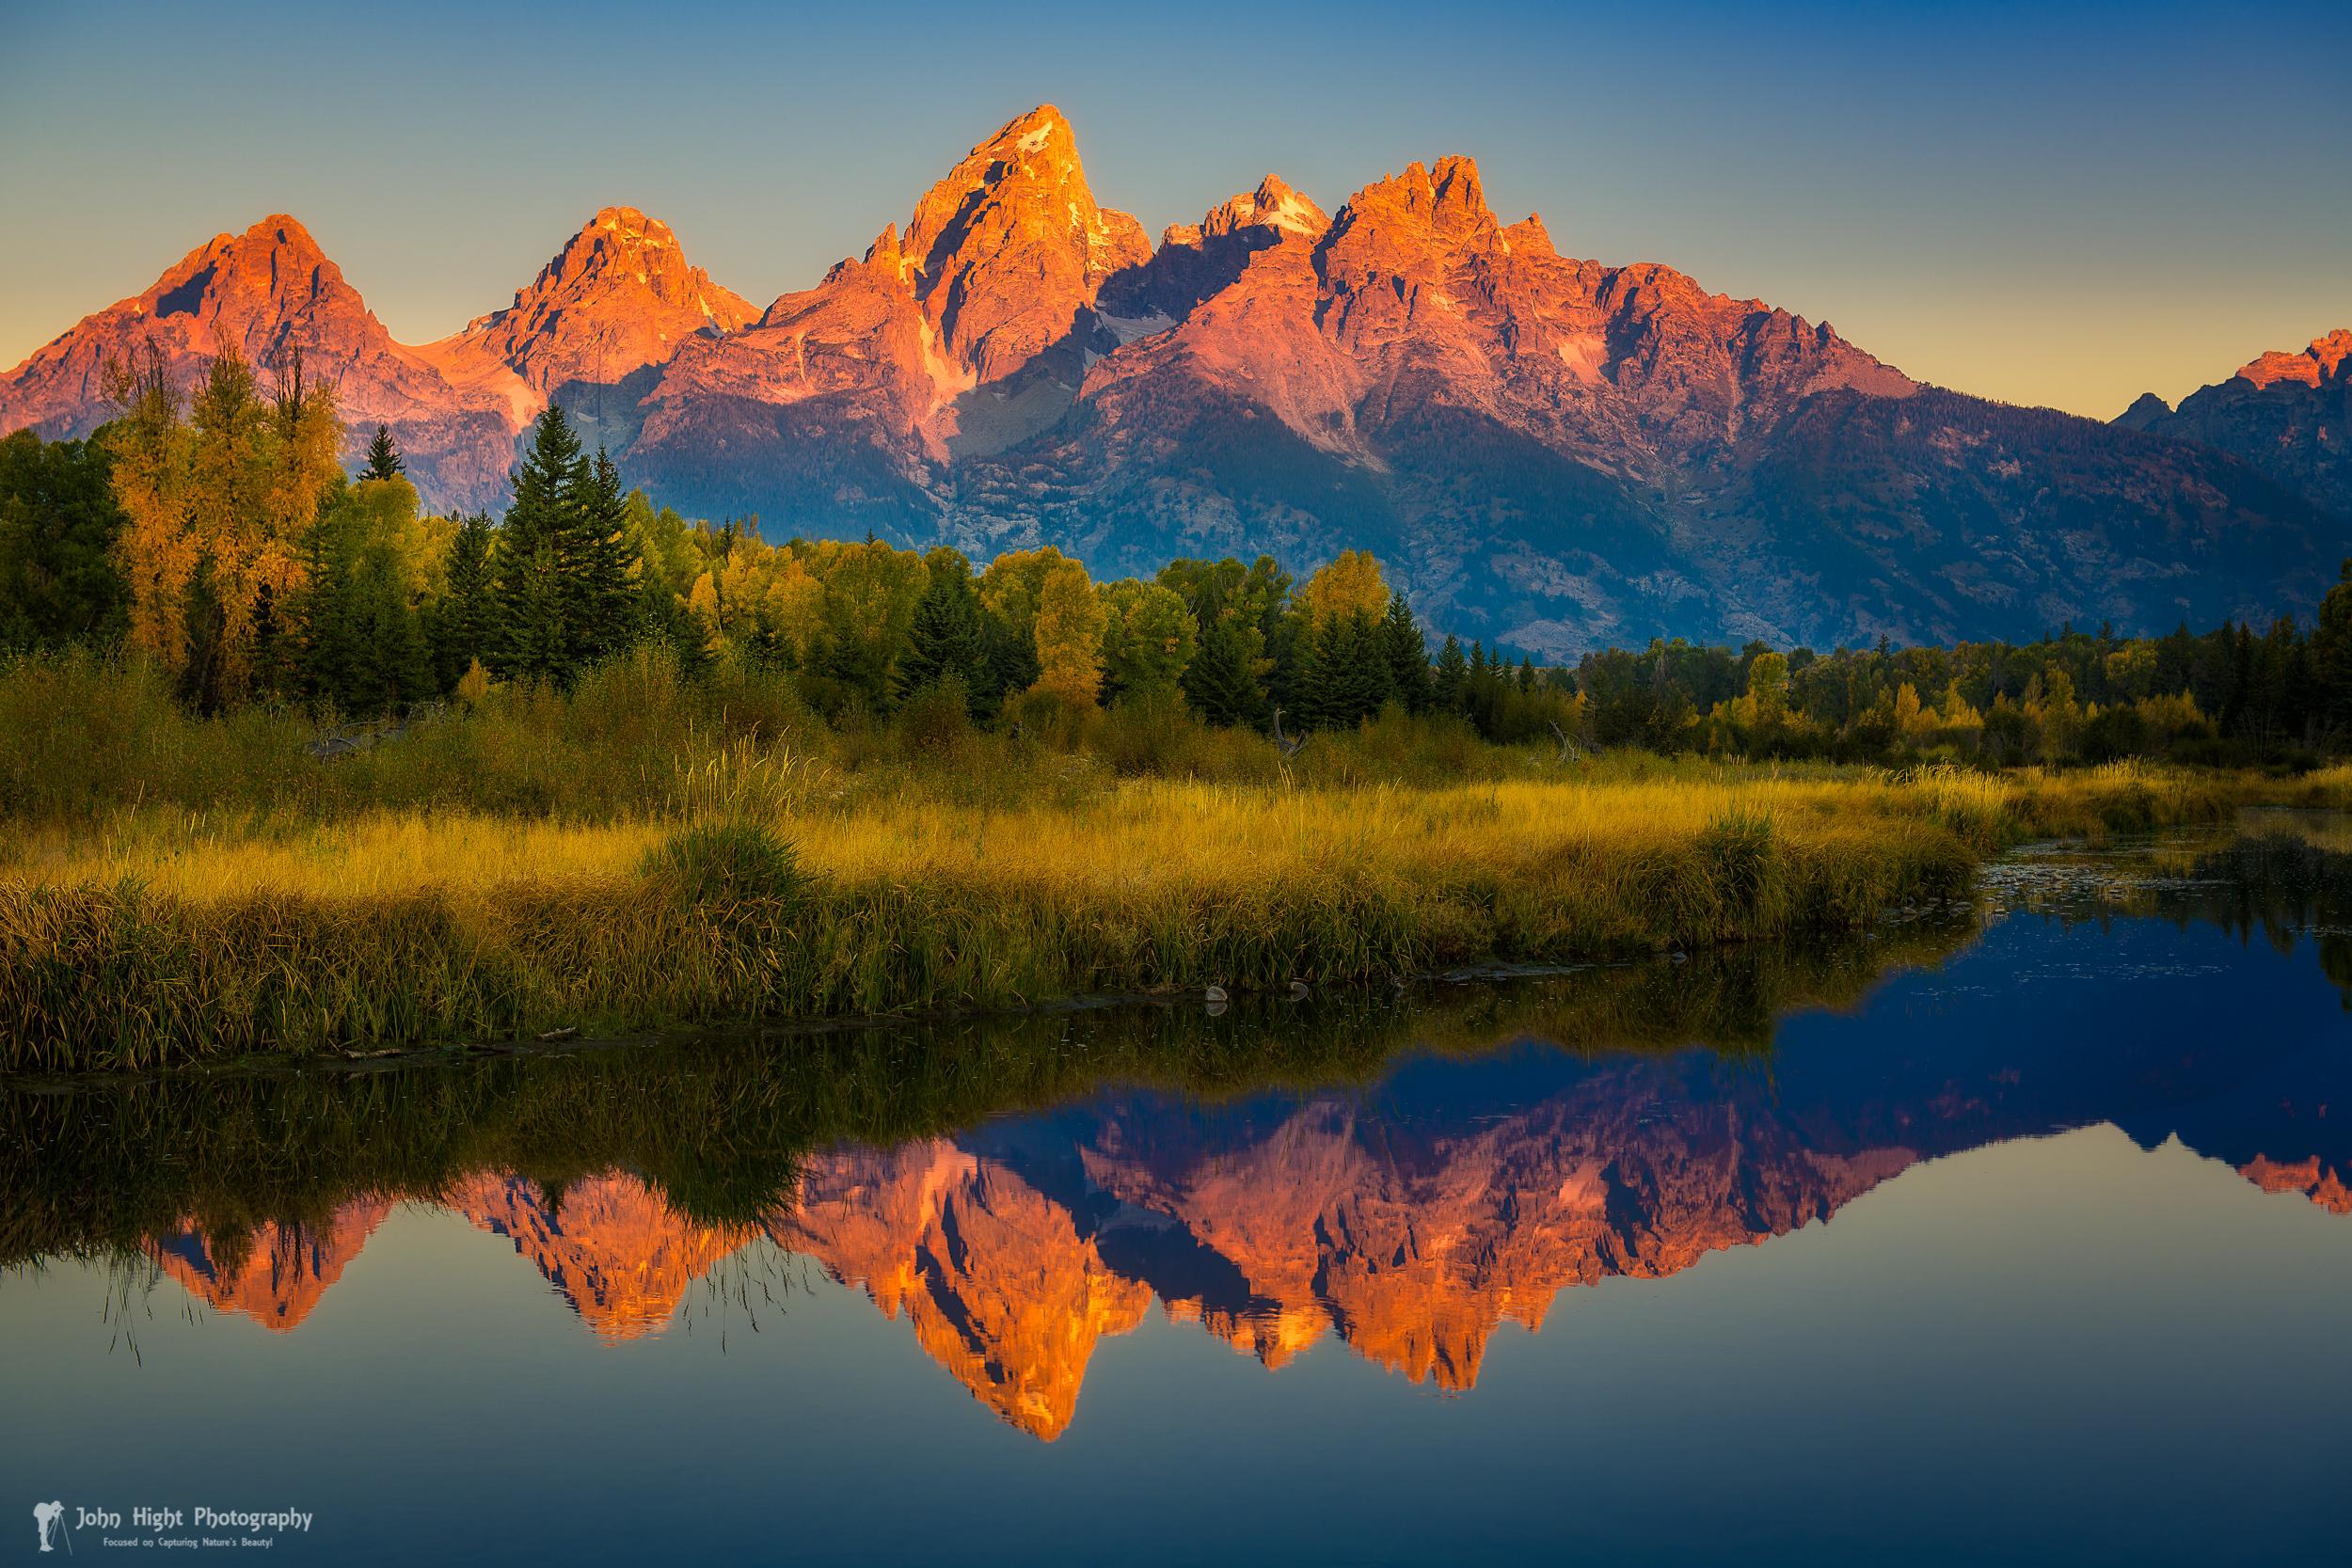 Morning View of Grand Tetons